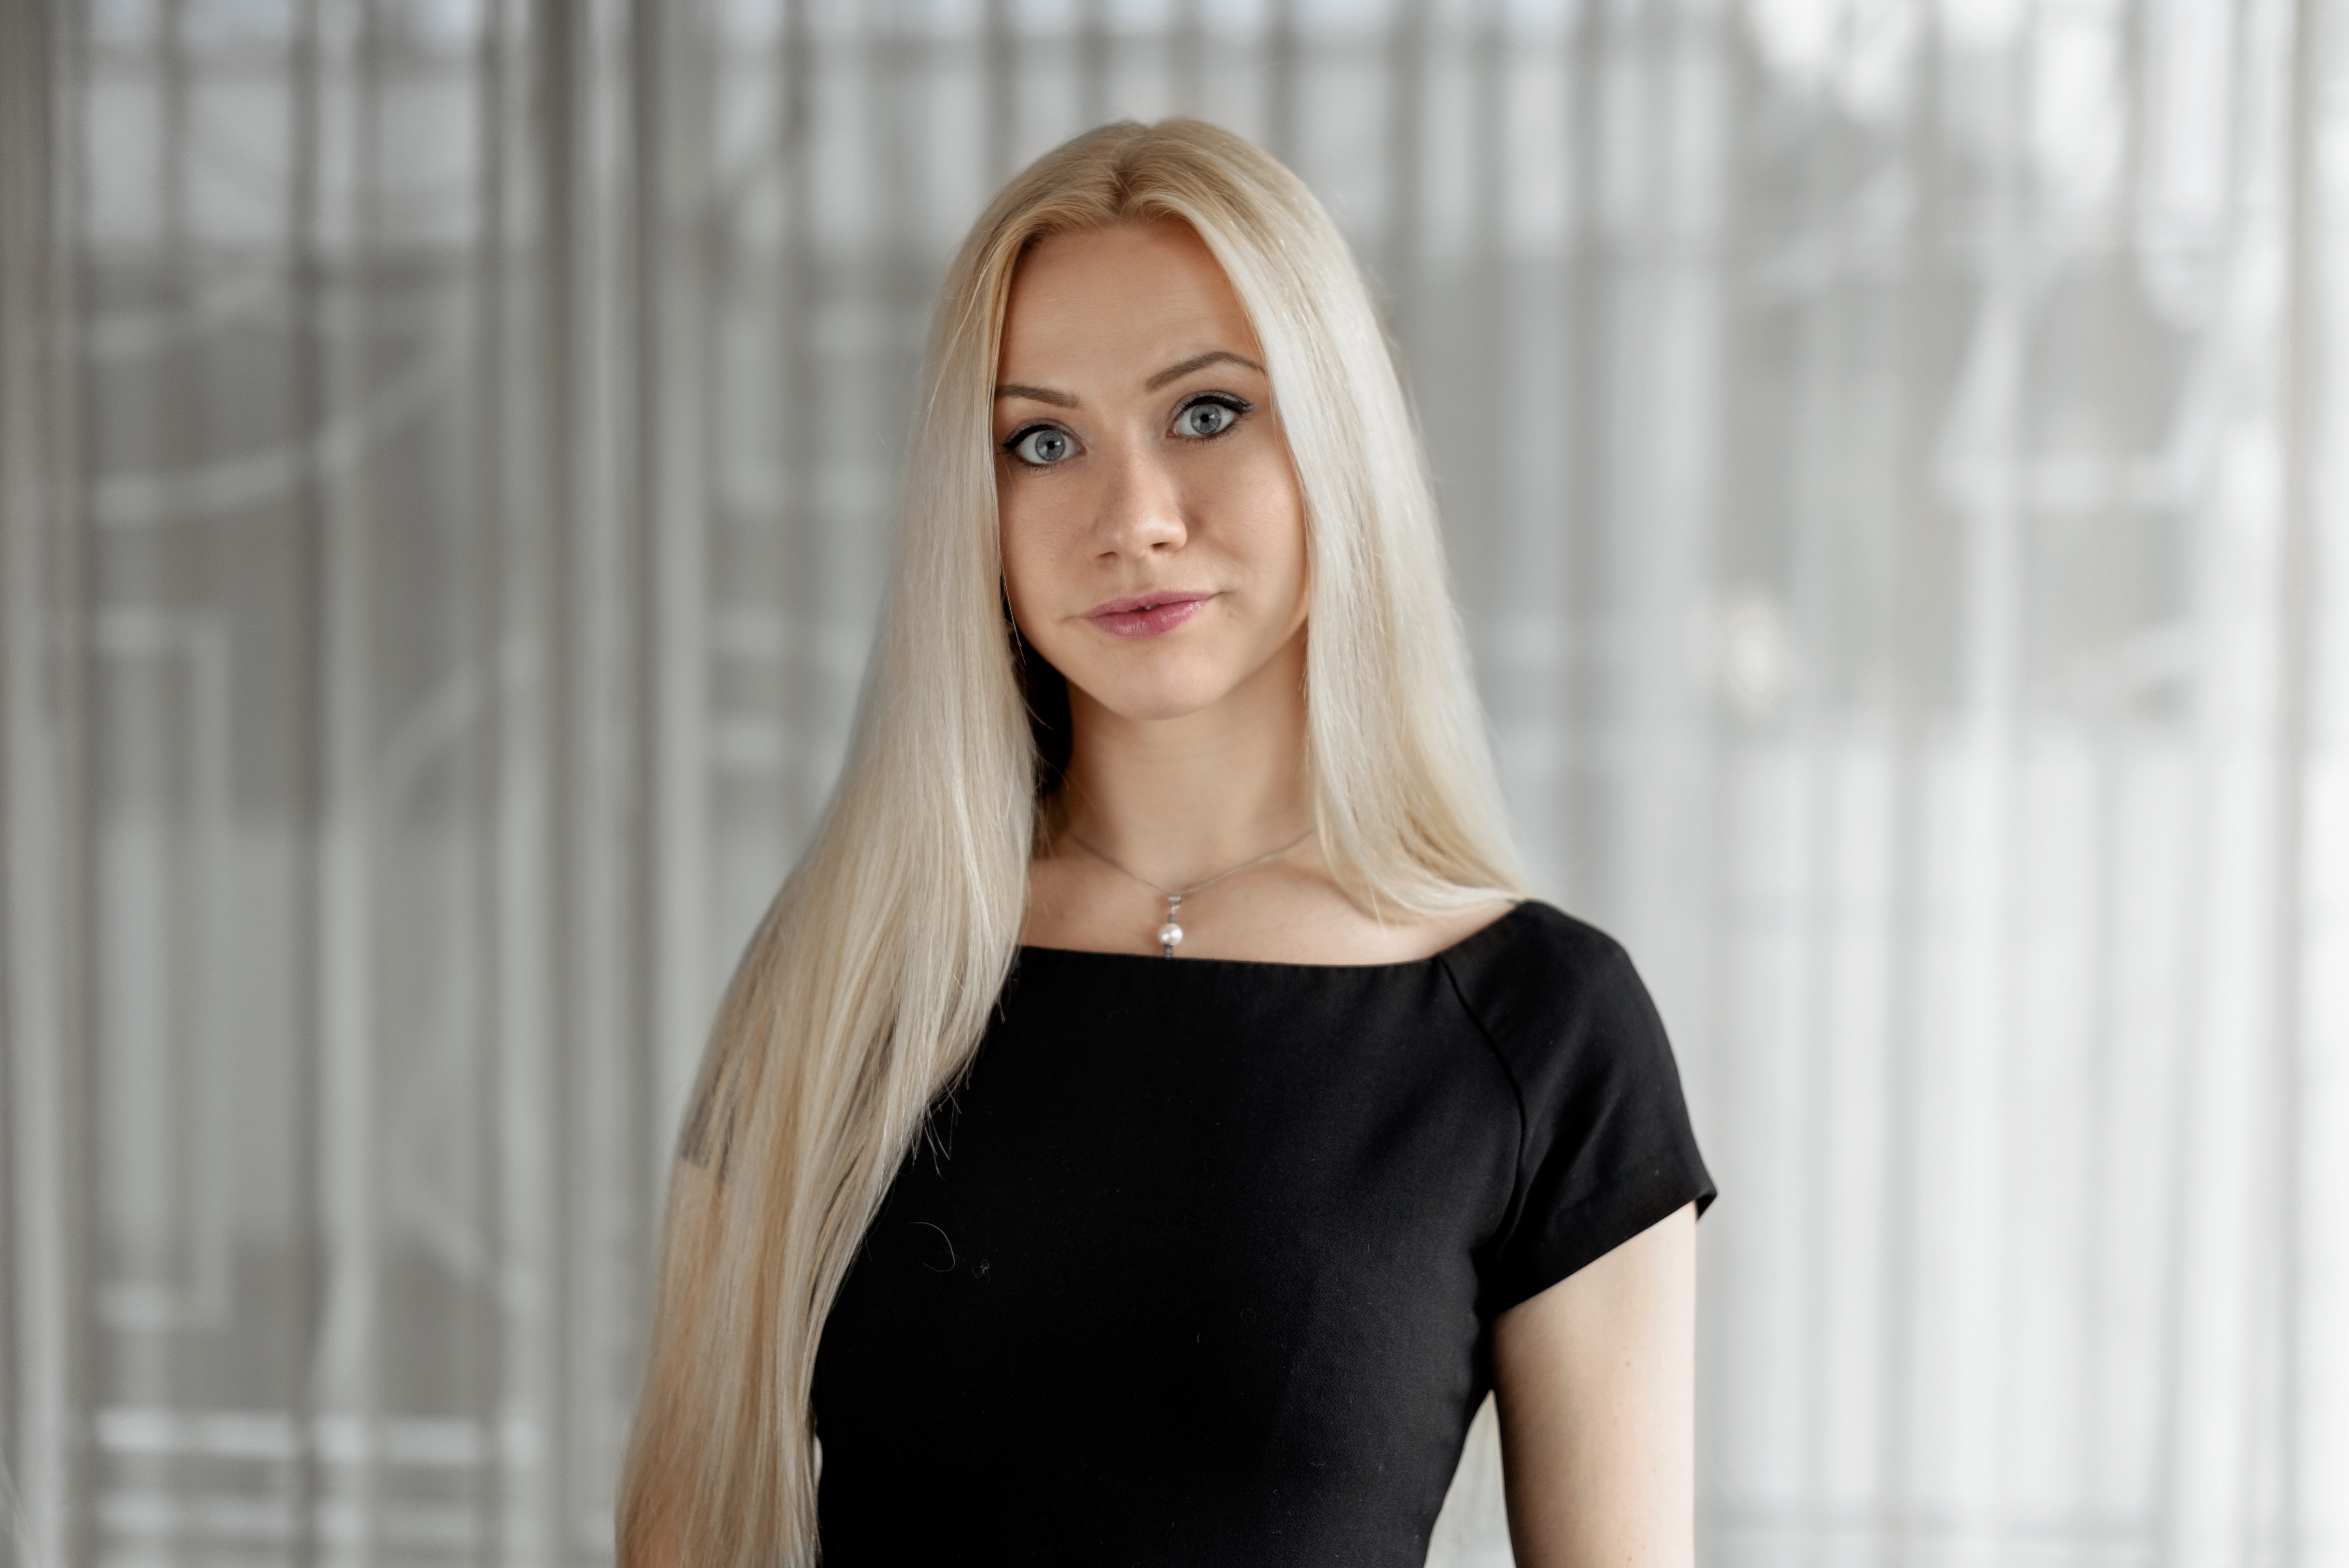 Elise Altroff